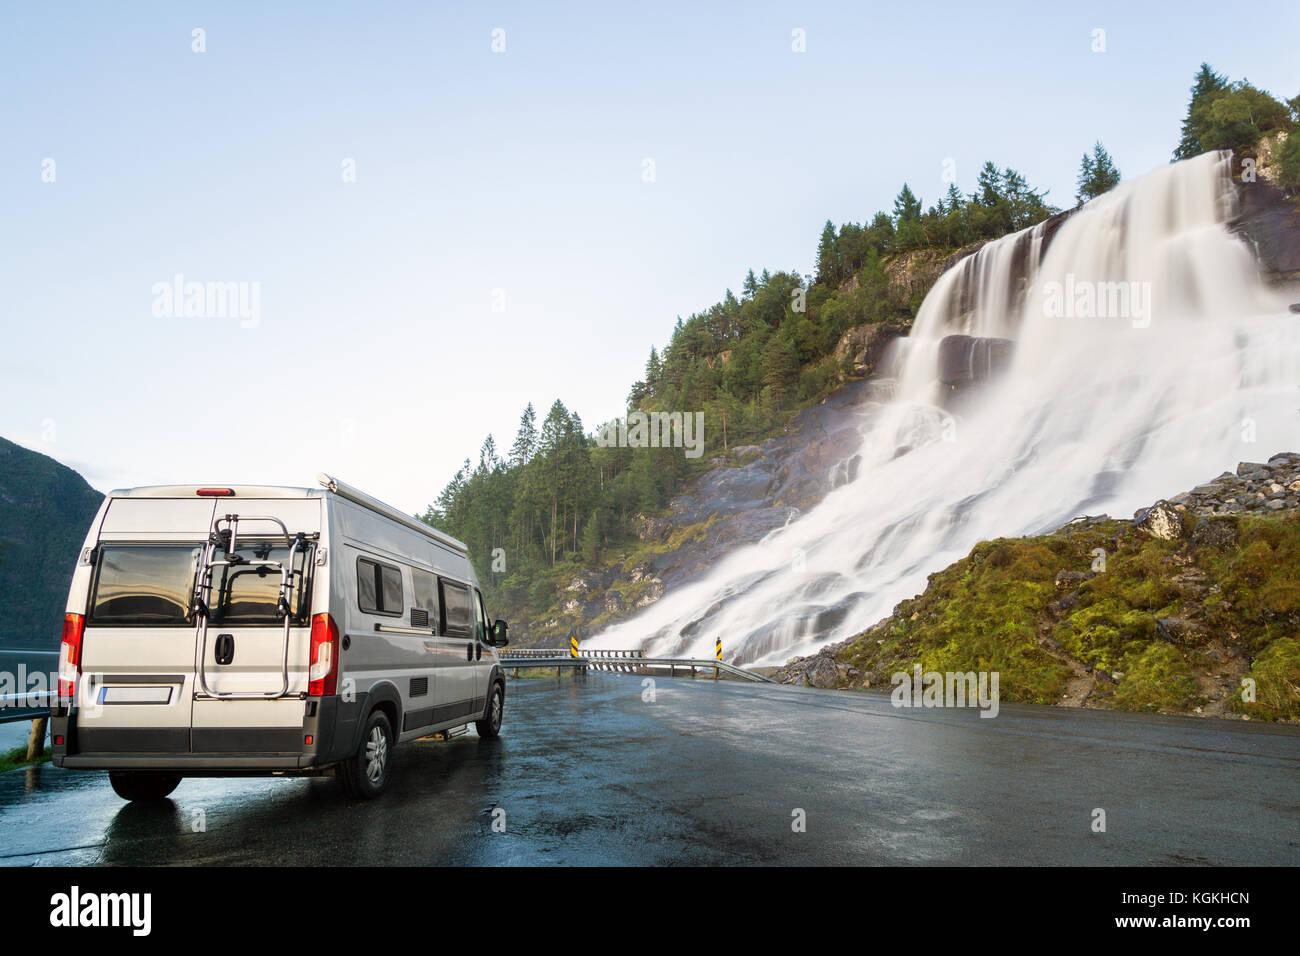 Camping Van Stockfotos & Camping Van Bilder Alamy